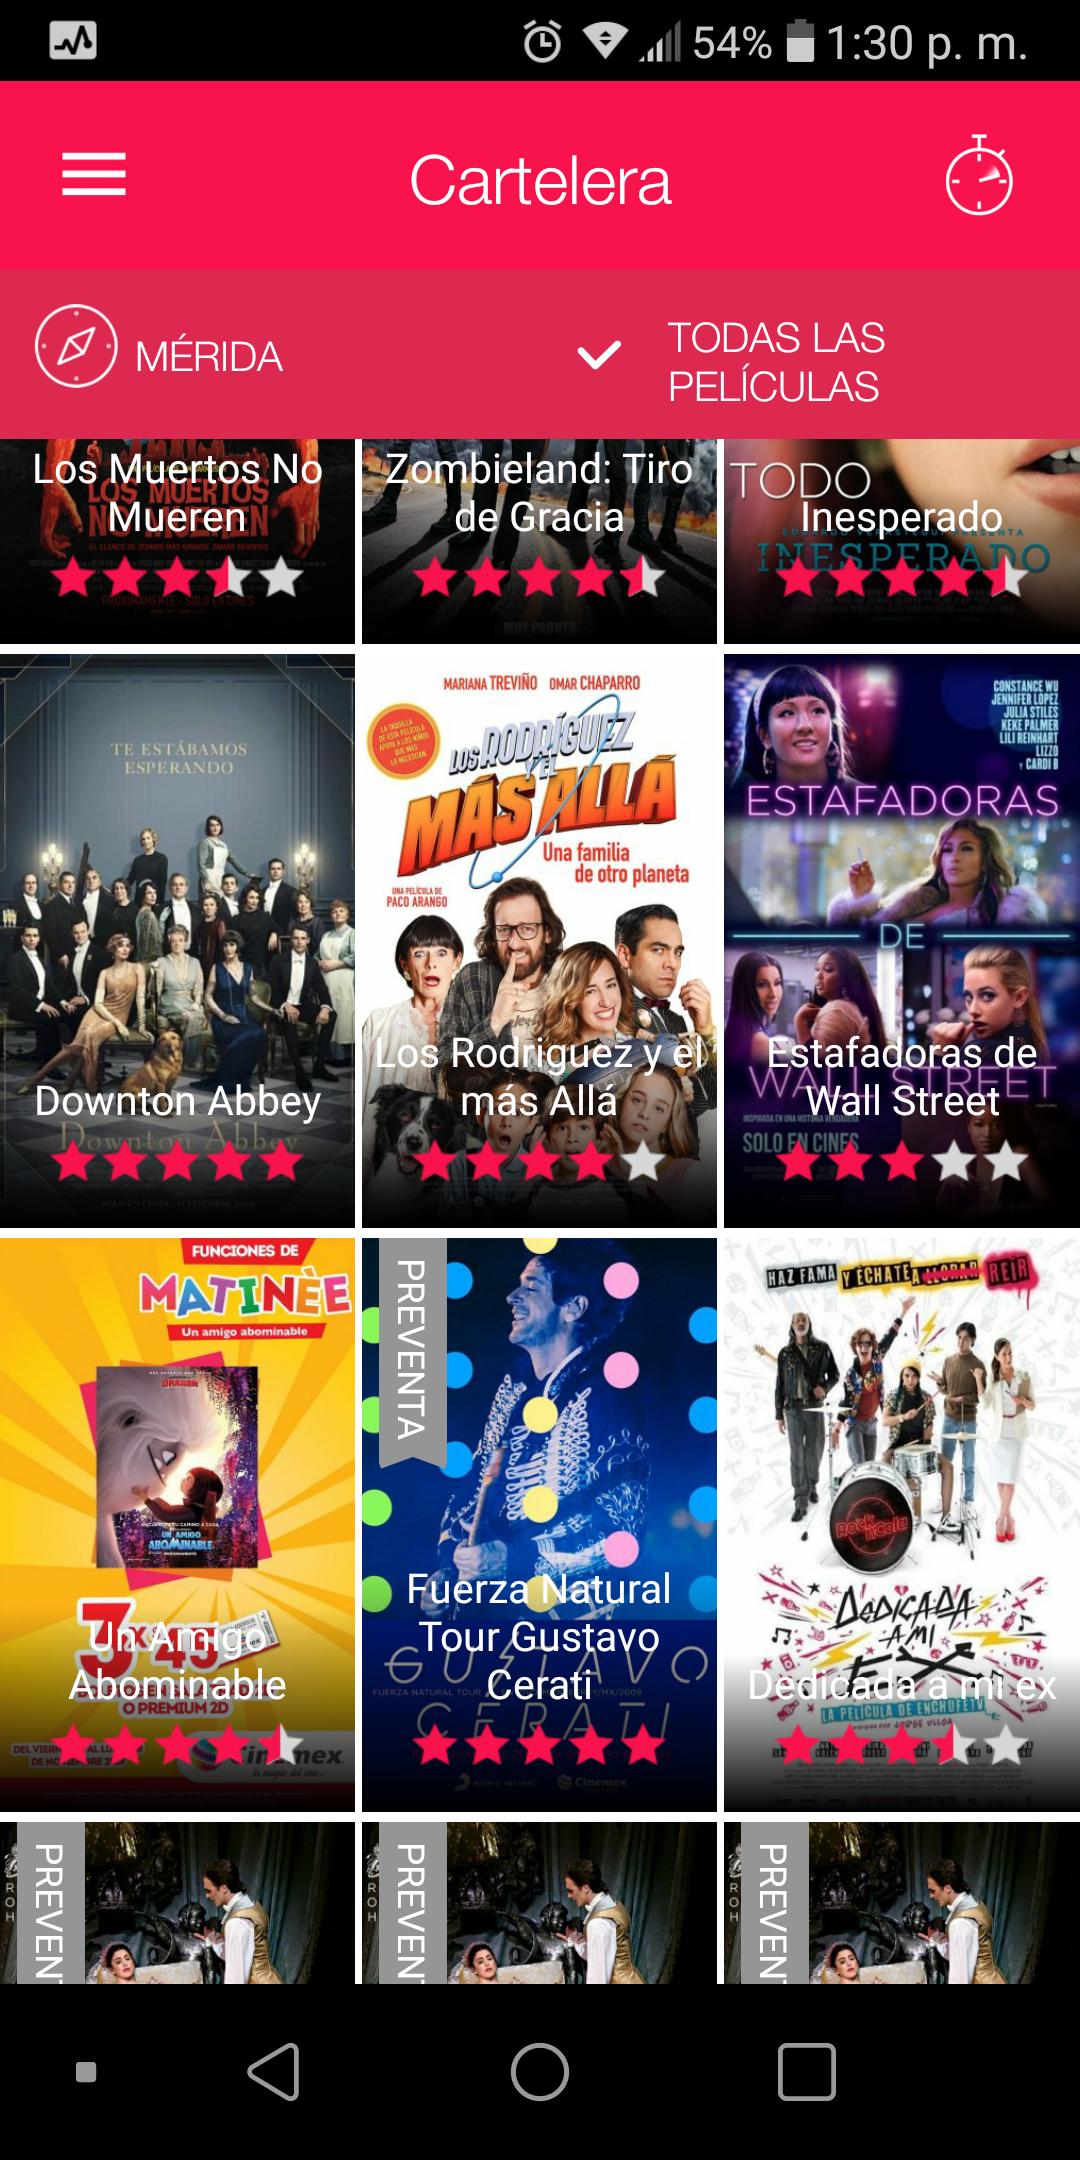 Cinemex: Matinee un amigo abominable 3 boletos por 45